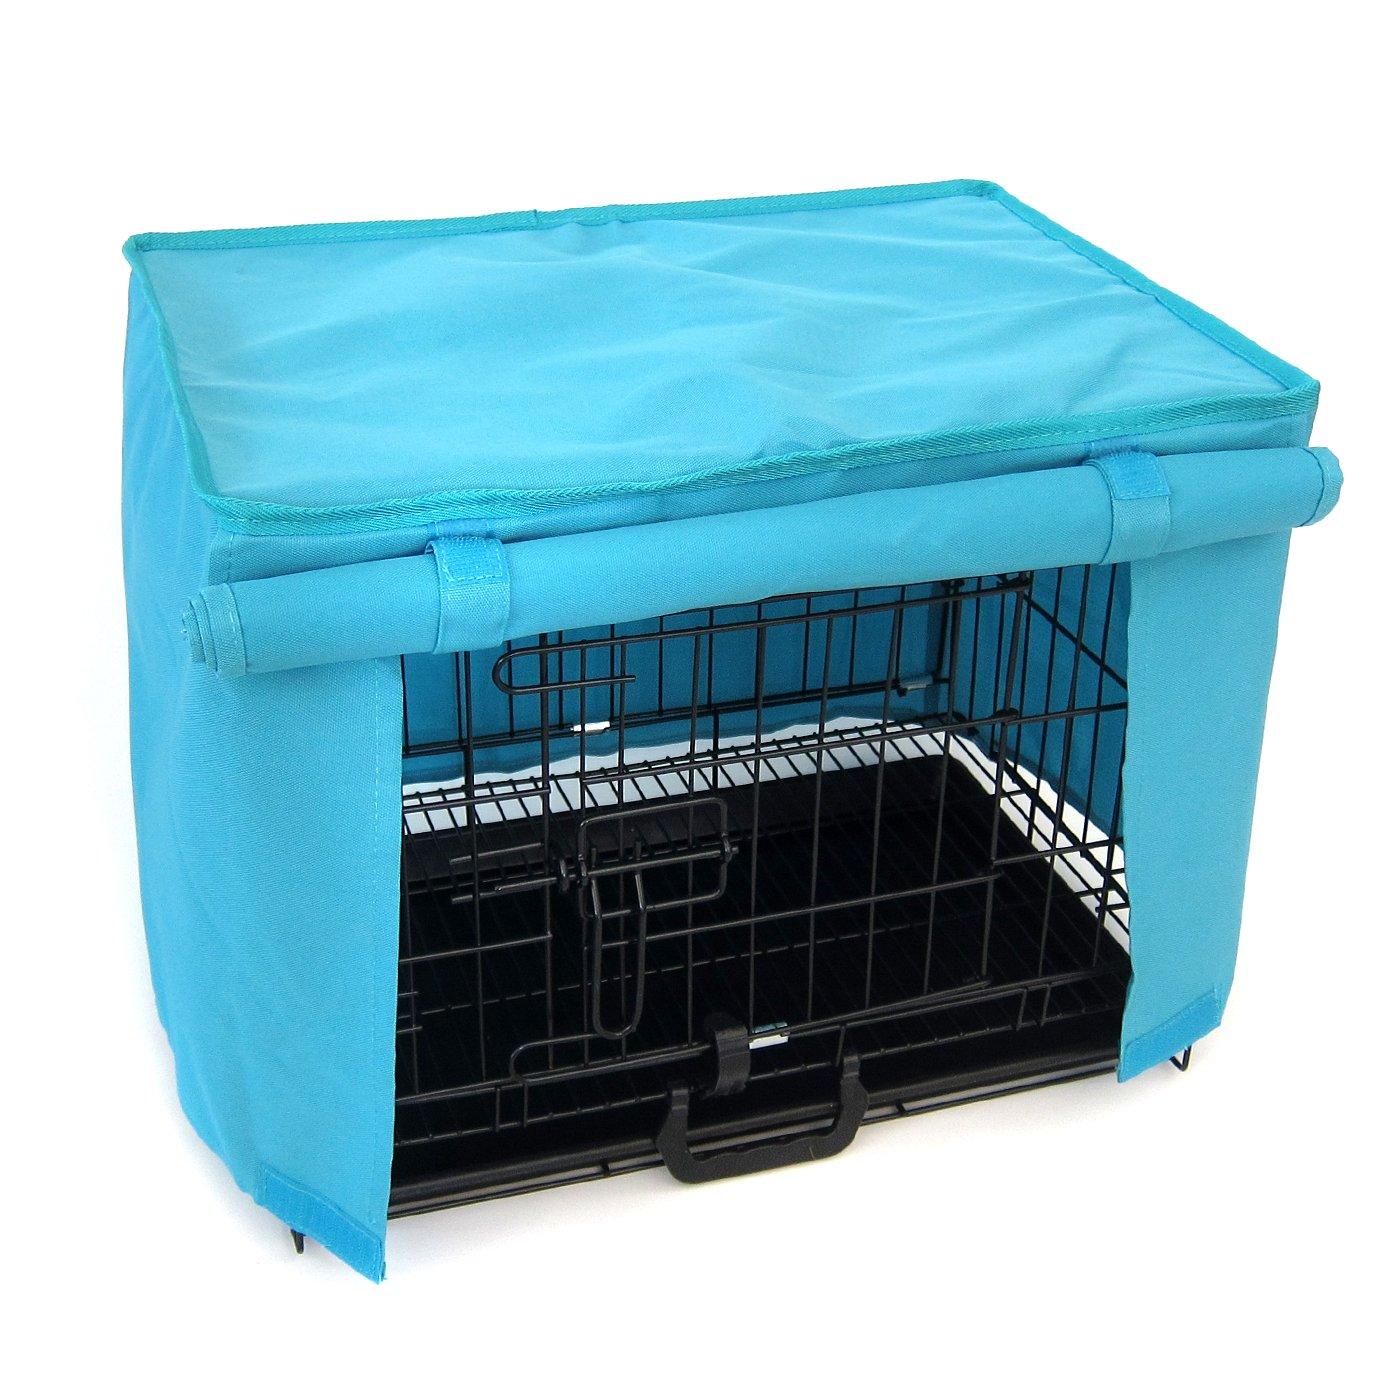 Alfie Pet by Petoga Couture - Dakota Pet Polyester Crate Cover - Color: Blue, Size: Medium